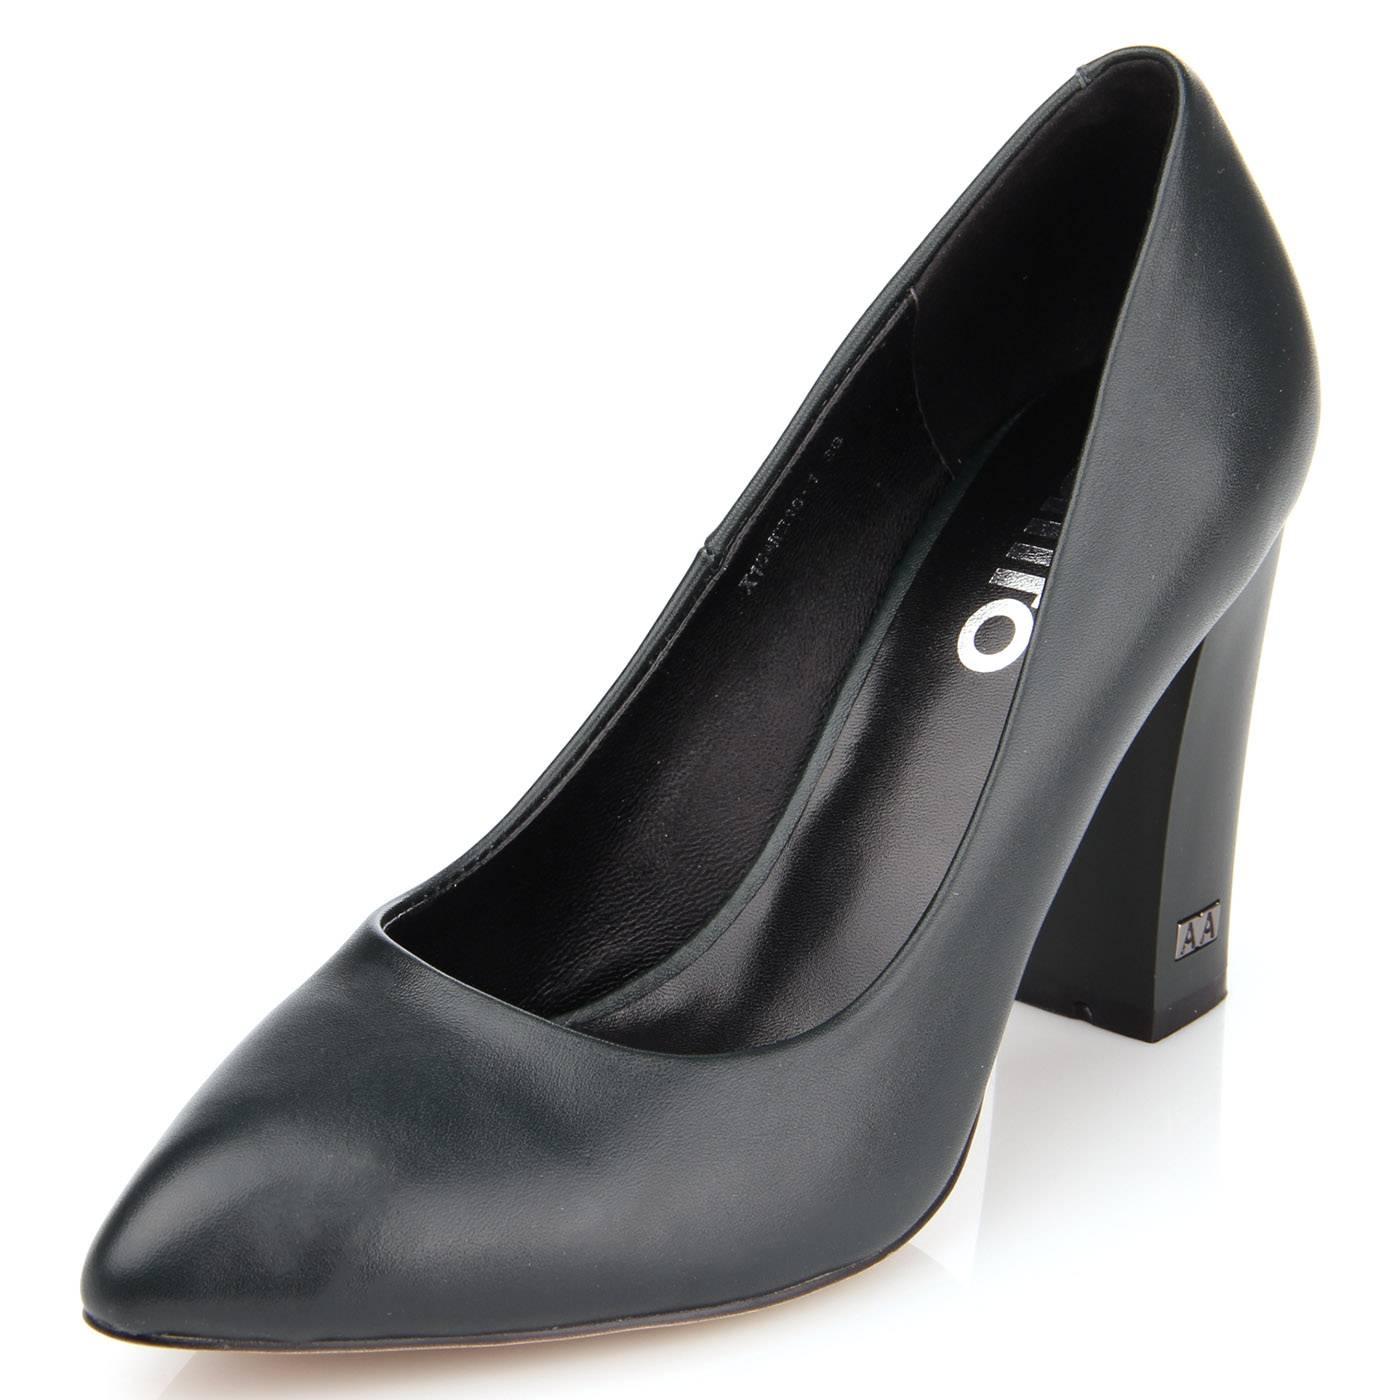 Туфлі жіночі ditto 5752 Зелений купить по выгодной цене в интернет ... 993758782b1e5